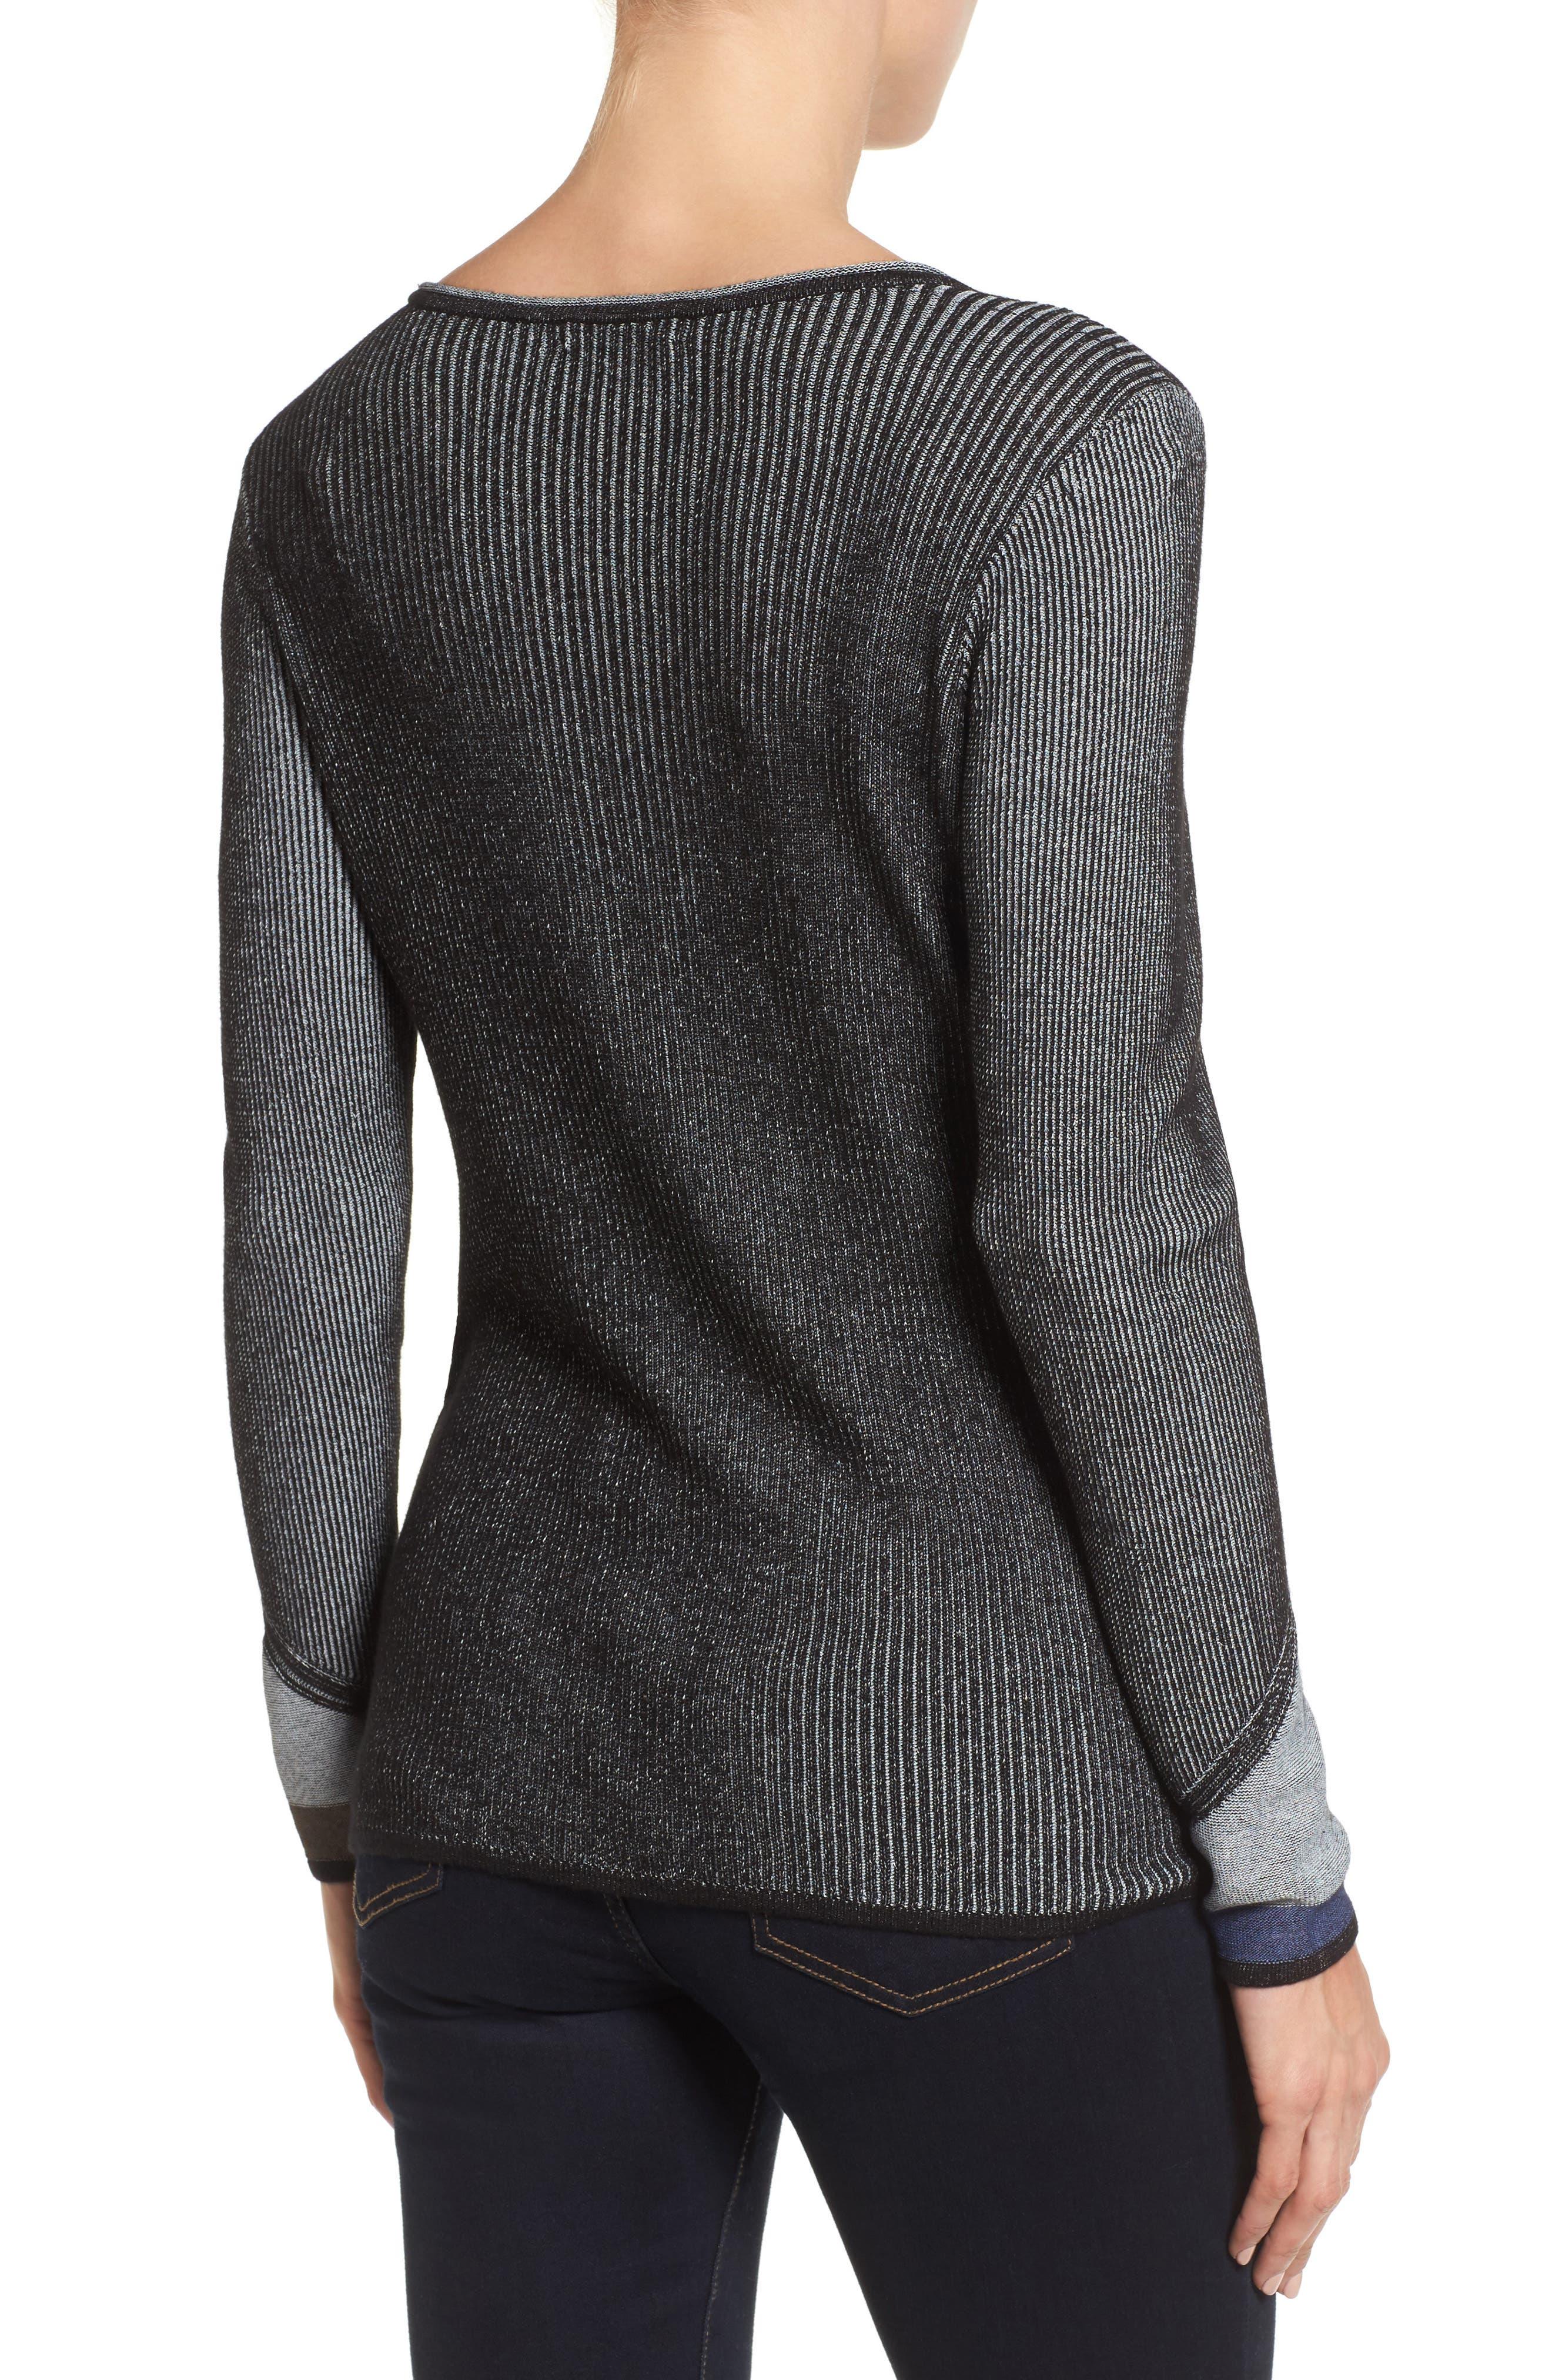 Blue Horizon Knit Top,                             Alternate thumbnail 2, color,                             499